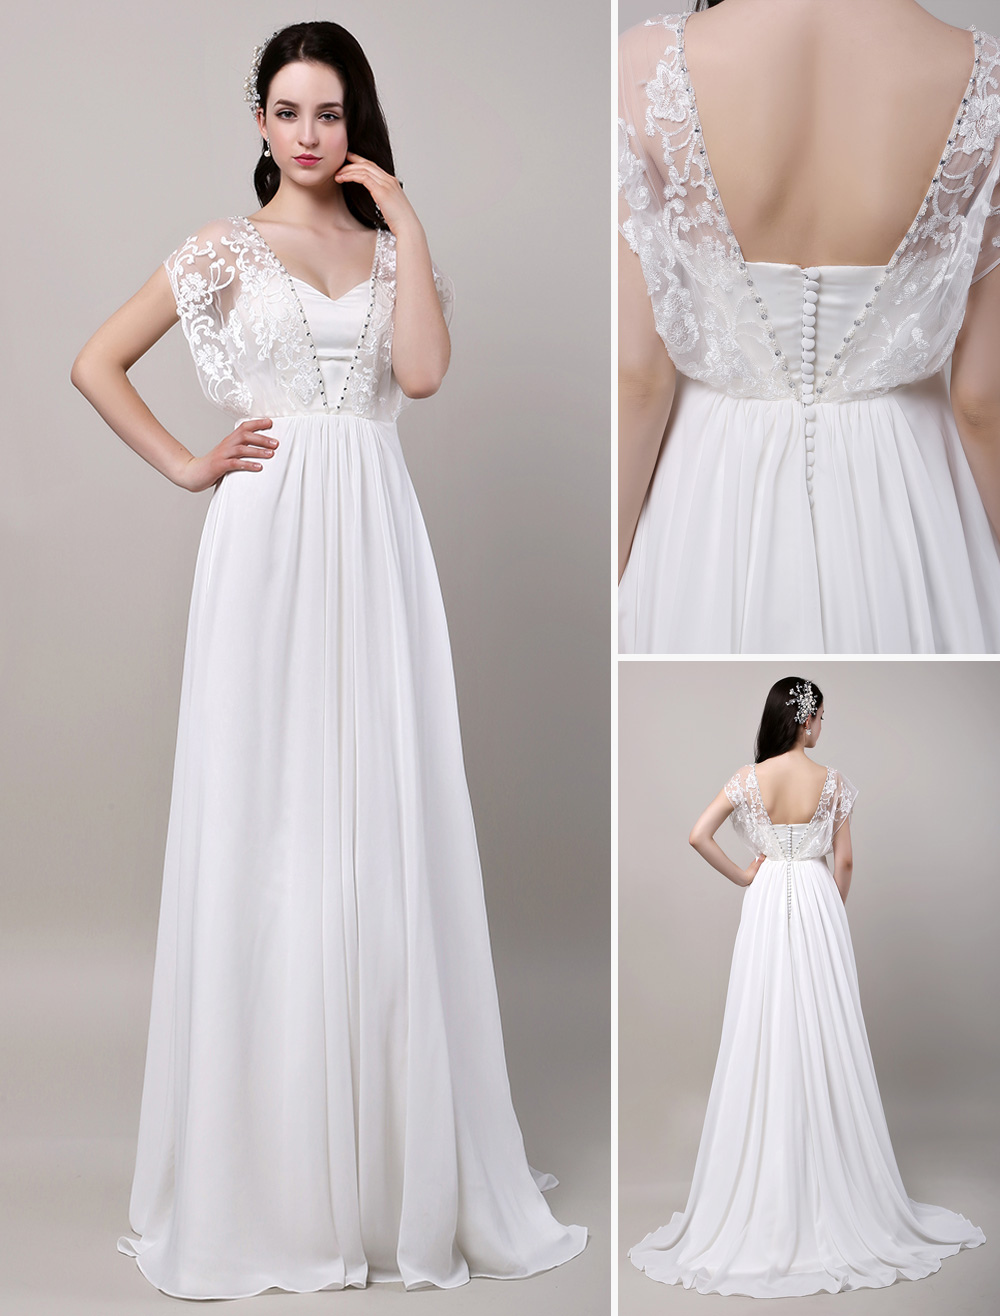 Chiffon wedding dress with lace sleeves